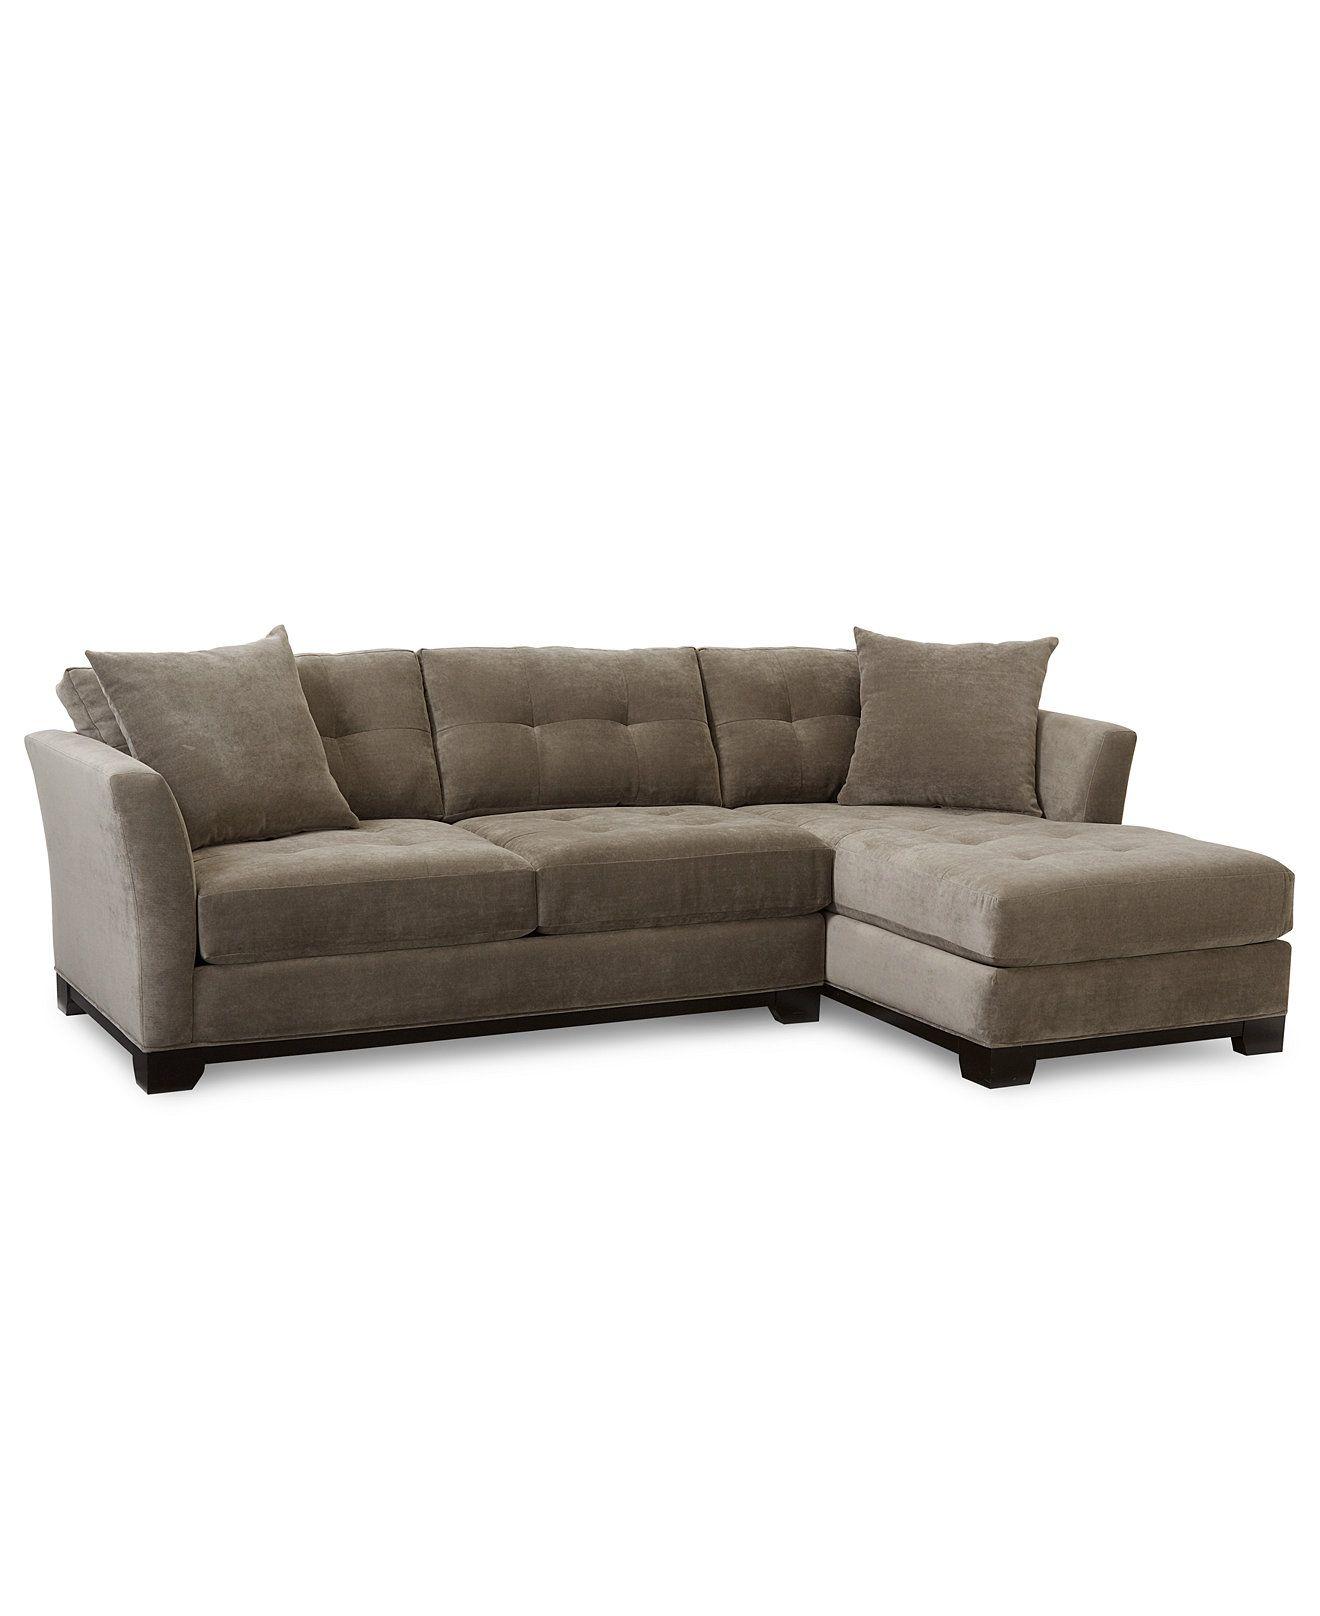 Microfiber Living Room Furniture Sets Elliot Fabric Microfiber 2 Pc Chaise Sectional Sofa Shops